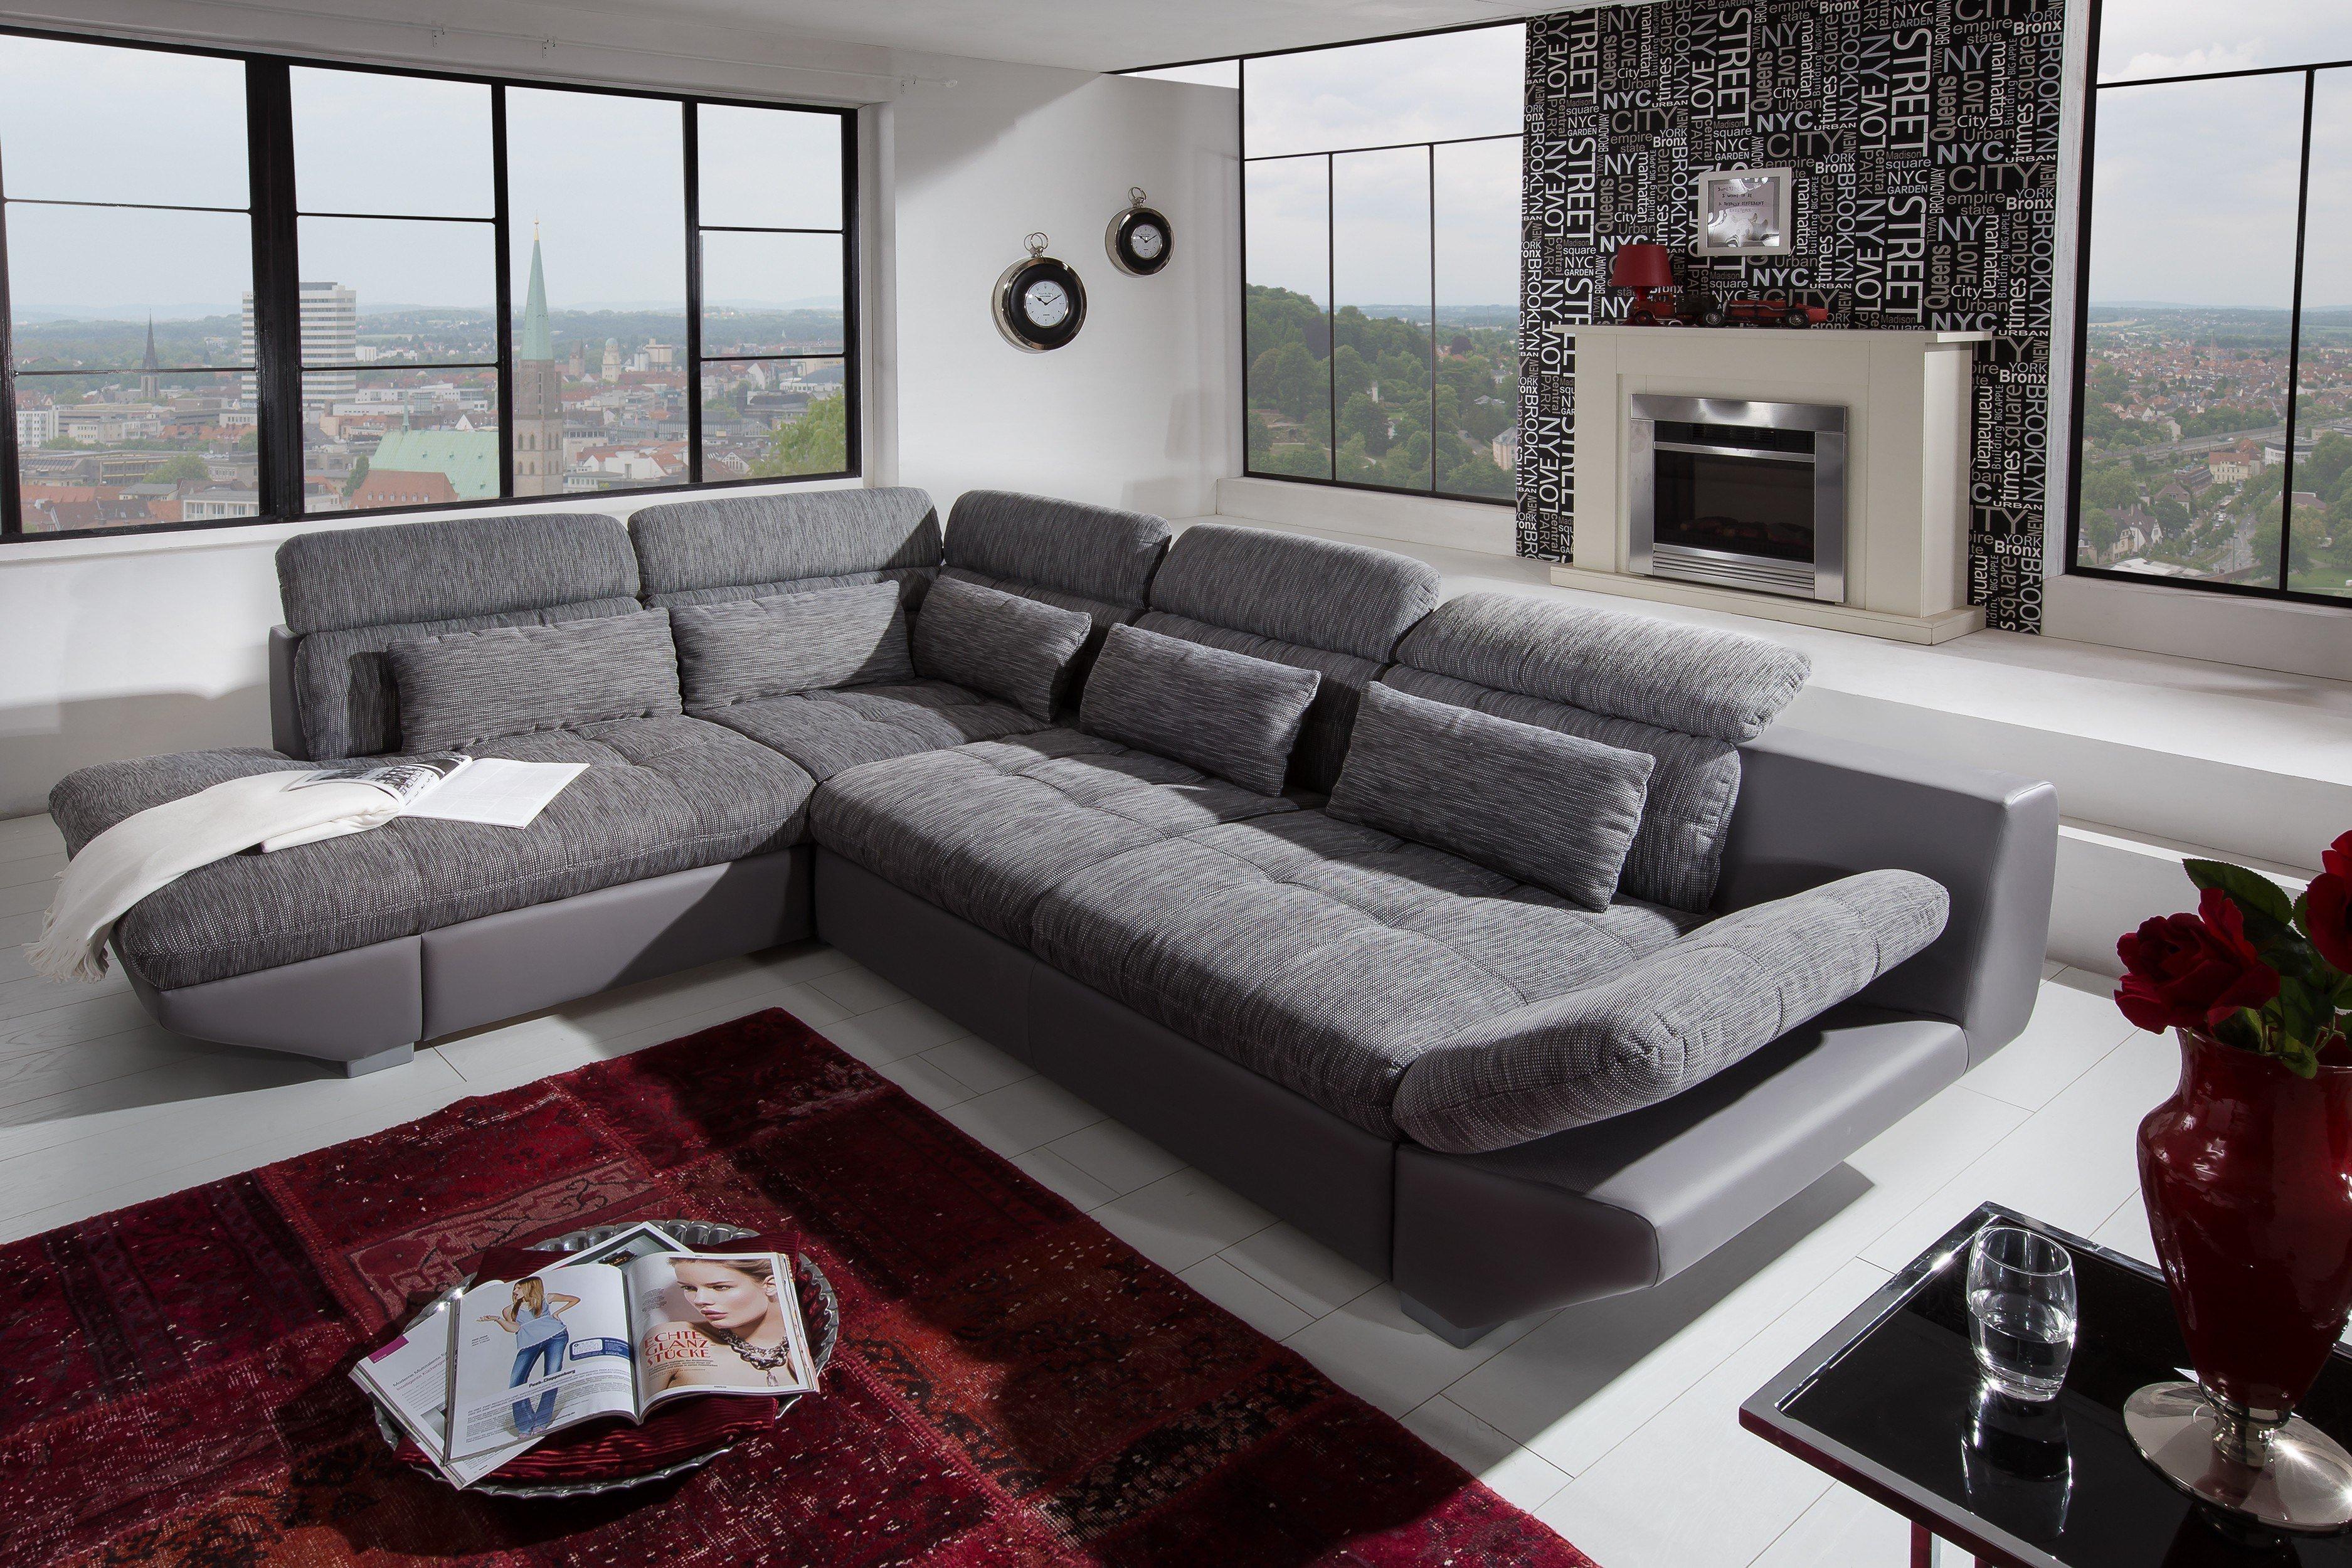 cotta eternity polstergarnitur in grau m bel letz ihr online shop. Black Bedroom Furniture Sets. Home Design Ideas